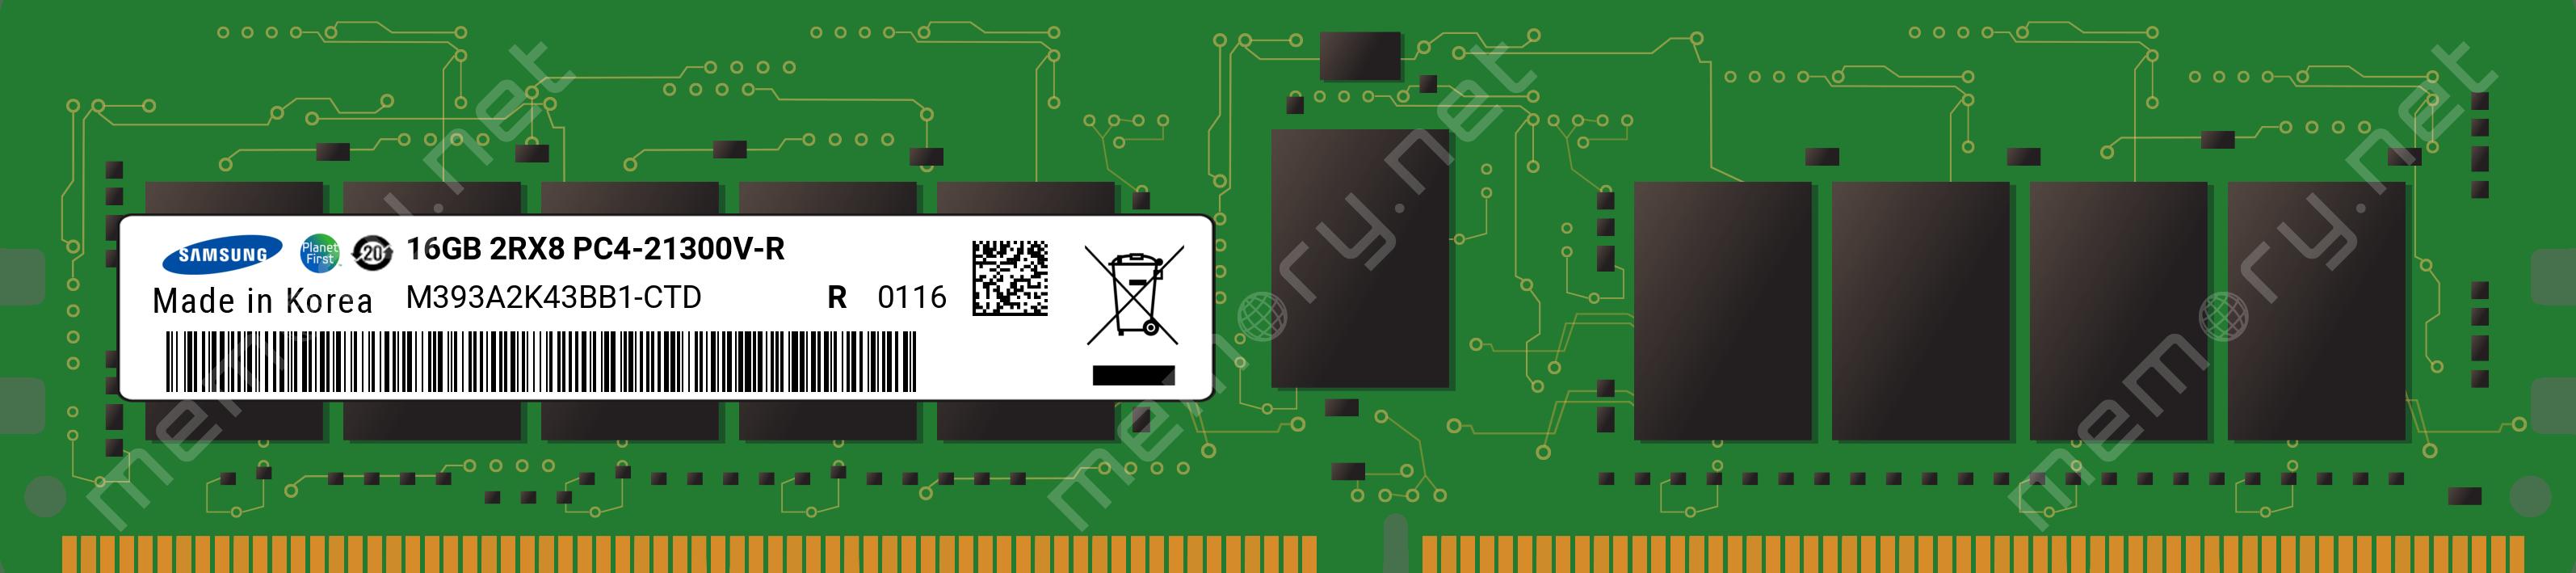 16GB PARTS-QUICK Brand Memory for HPE Cloudline CL4100 Gen10 DDR4-2666 CAS-19-19-19 ECC Registered DIMM RAM 1x16GB